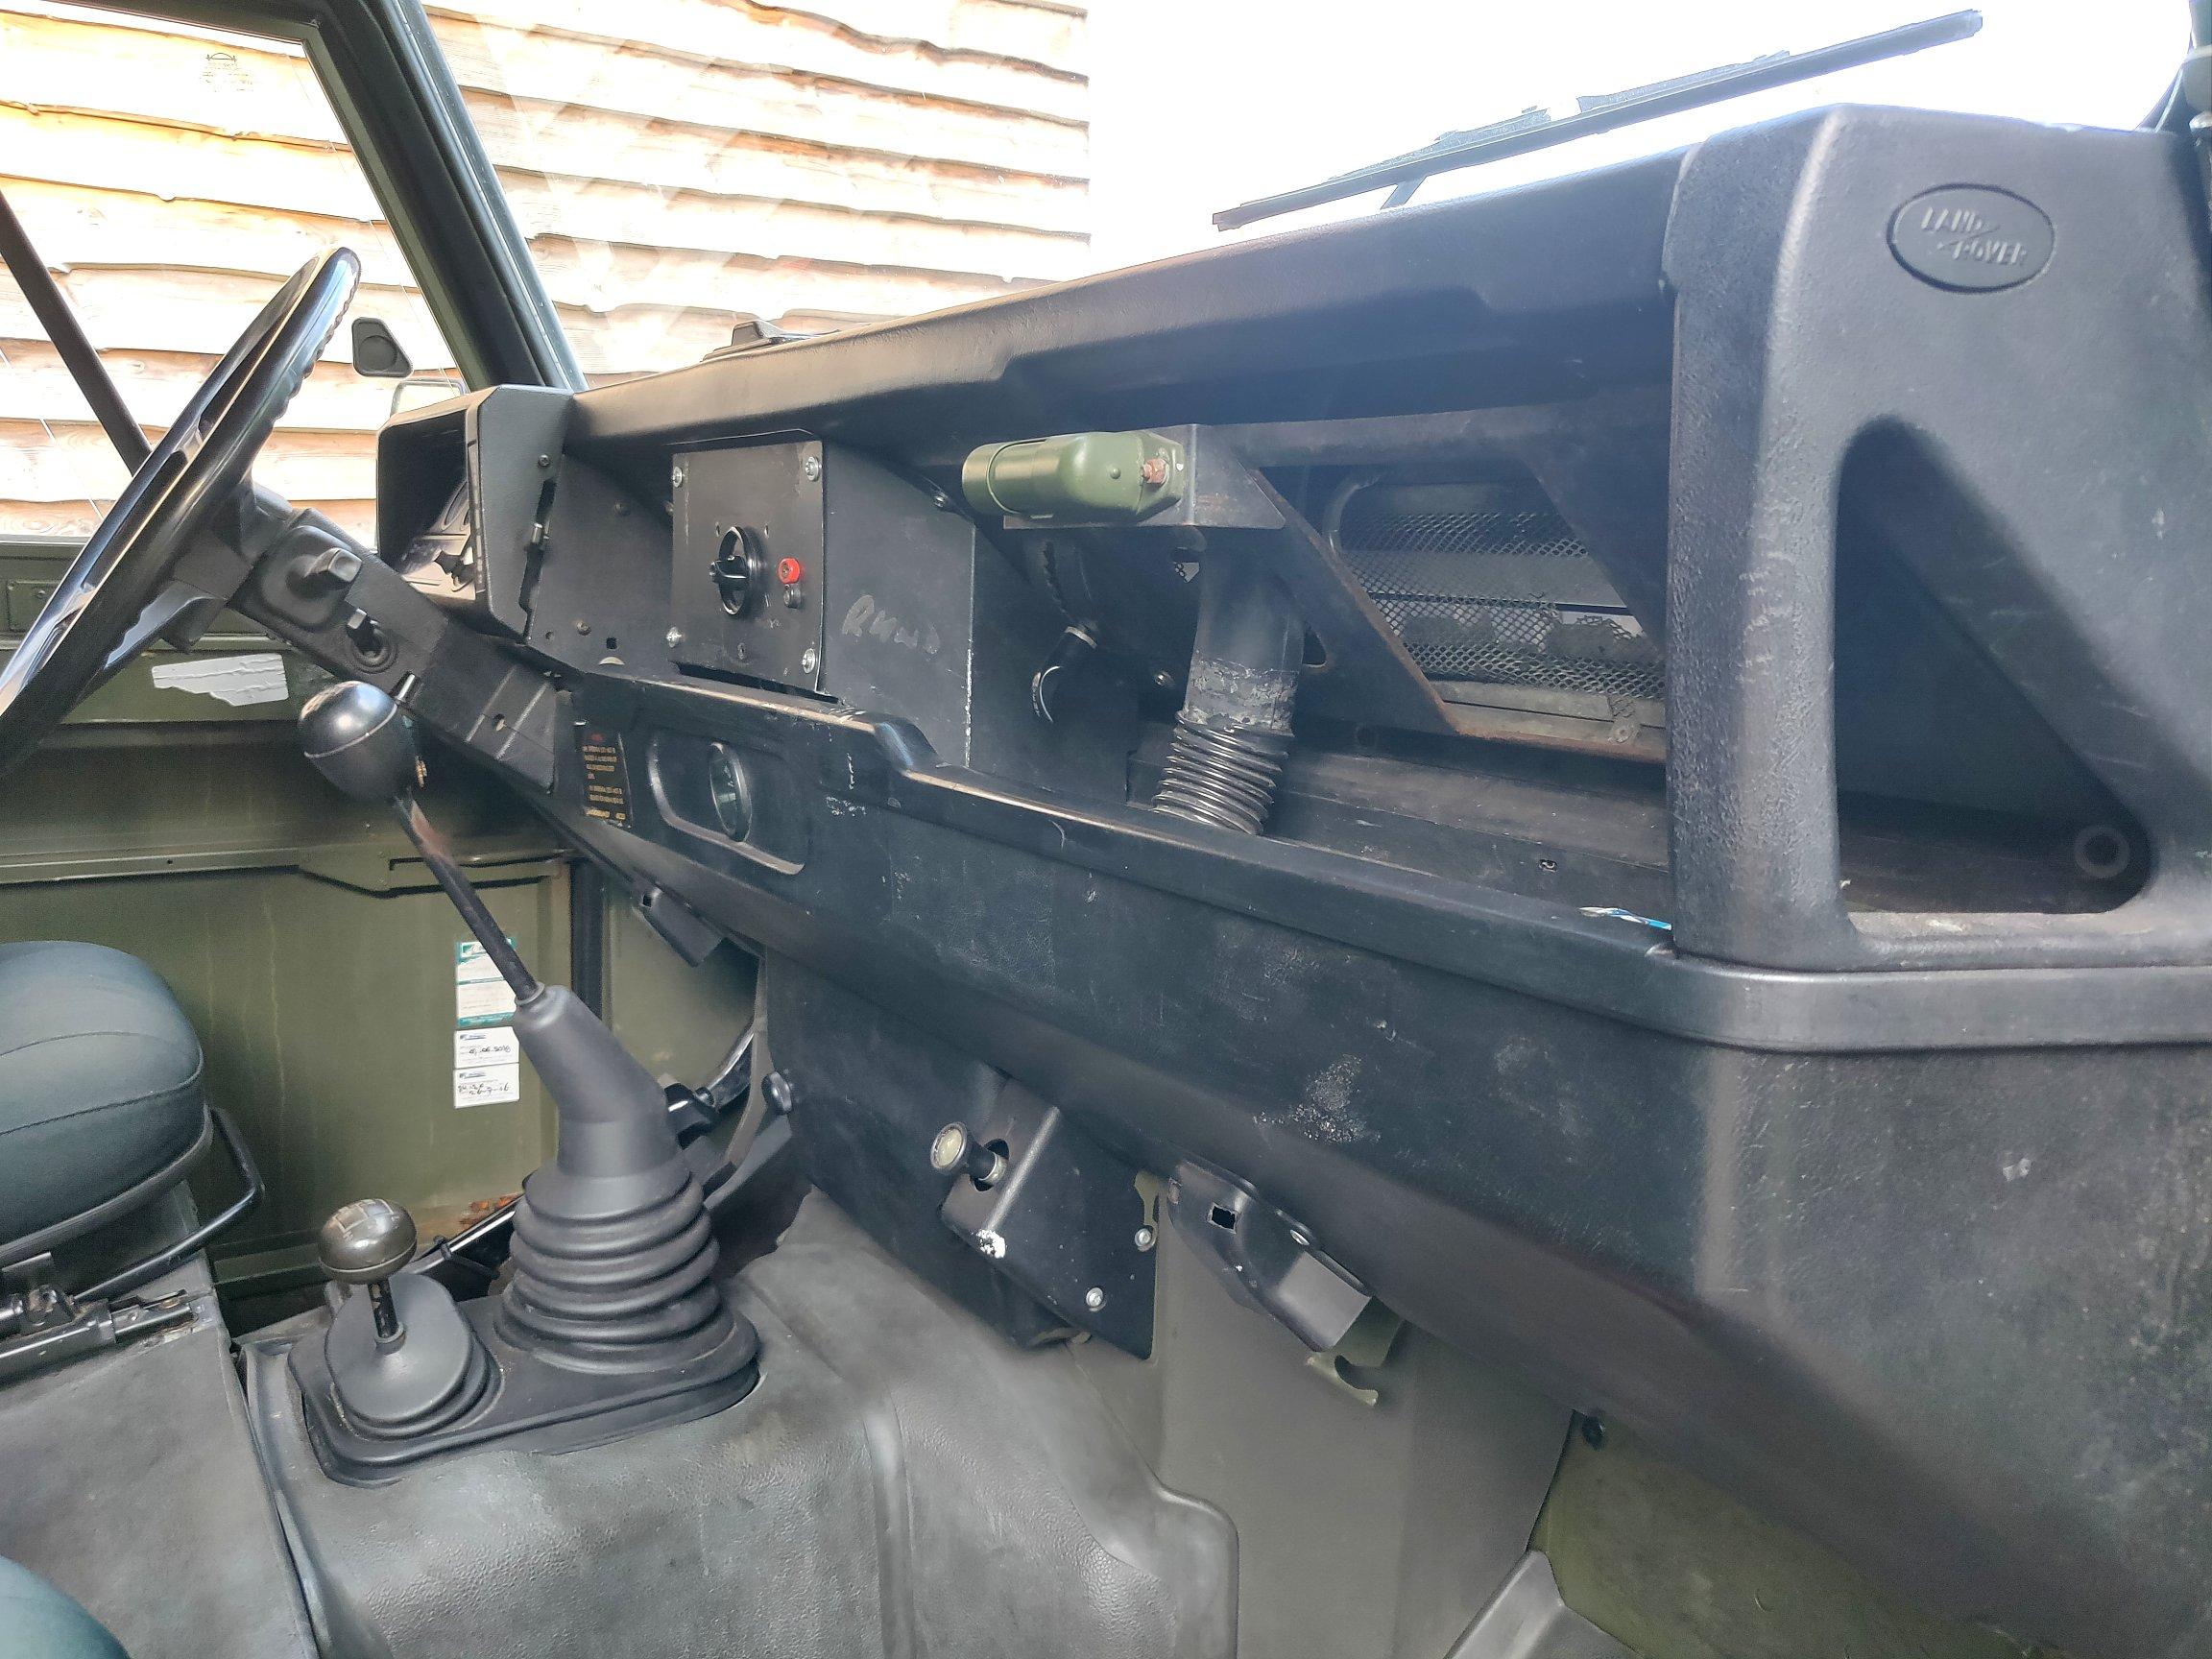 1986 LR LHD Defender Tithonus dash and trim.jpg